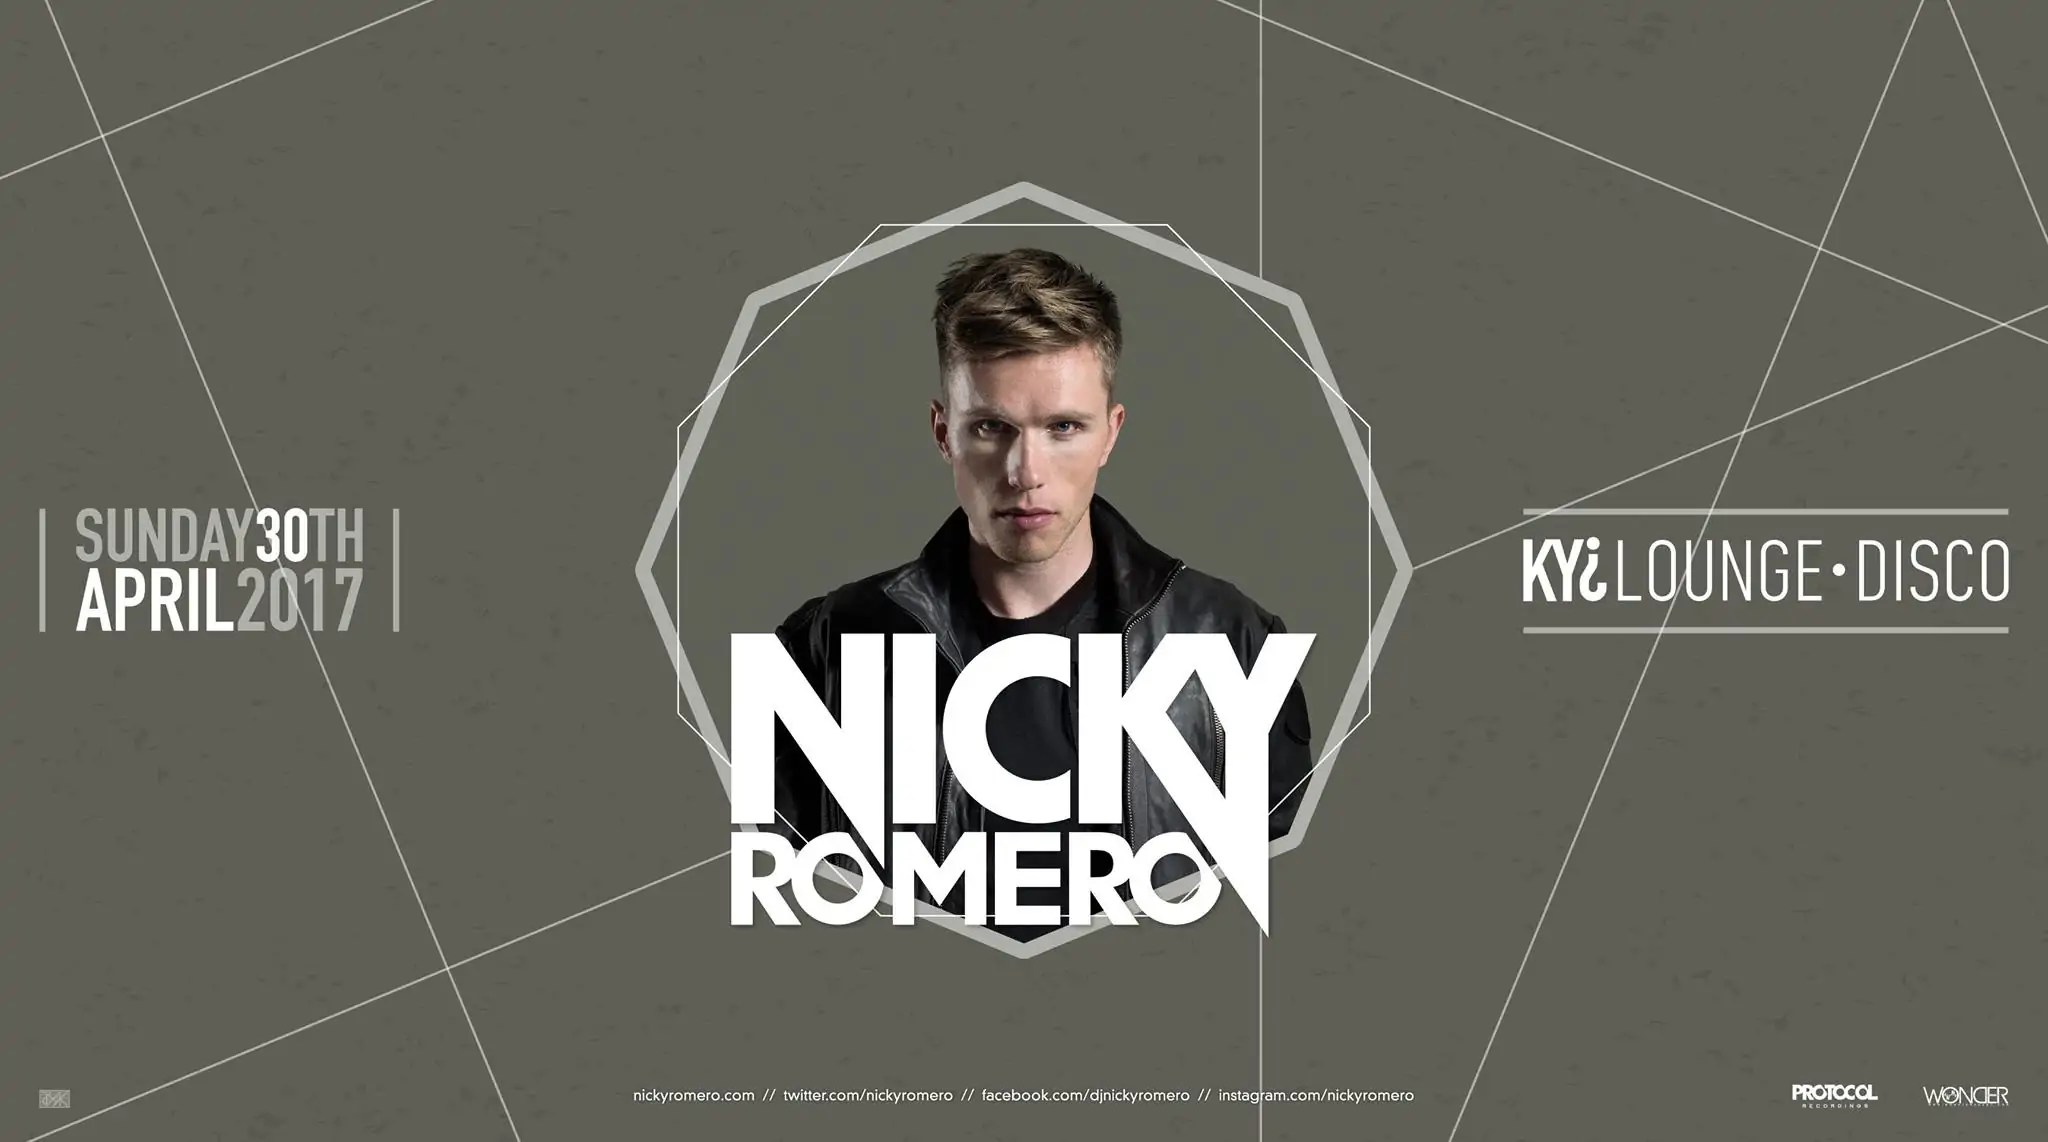 NICKY ROMERO KYI DISCO MODENA 30 APRILE 2017 – Prezzi Ticket Biglietti Tavoli Pacchetti Hotel